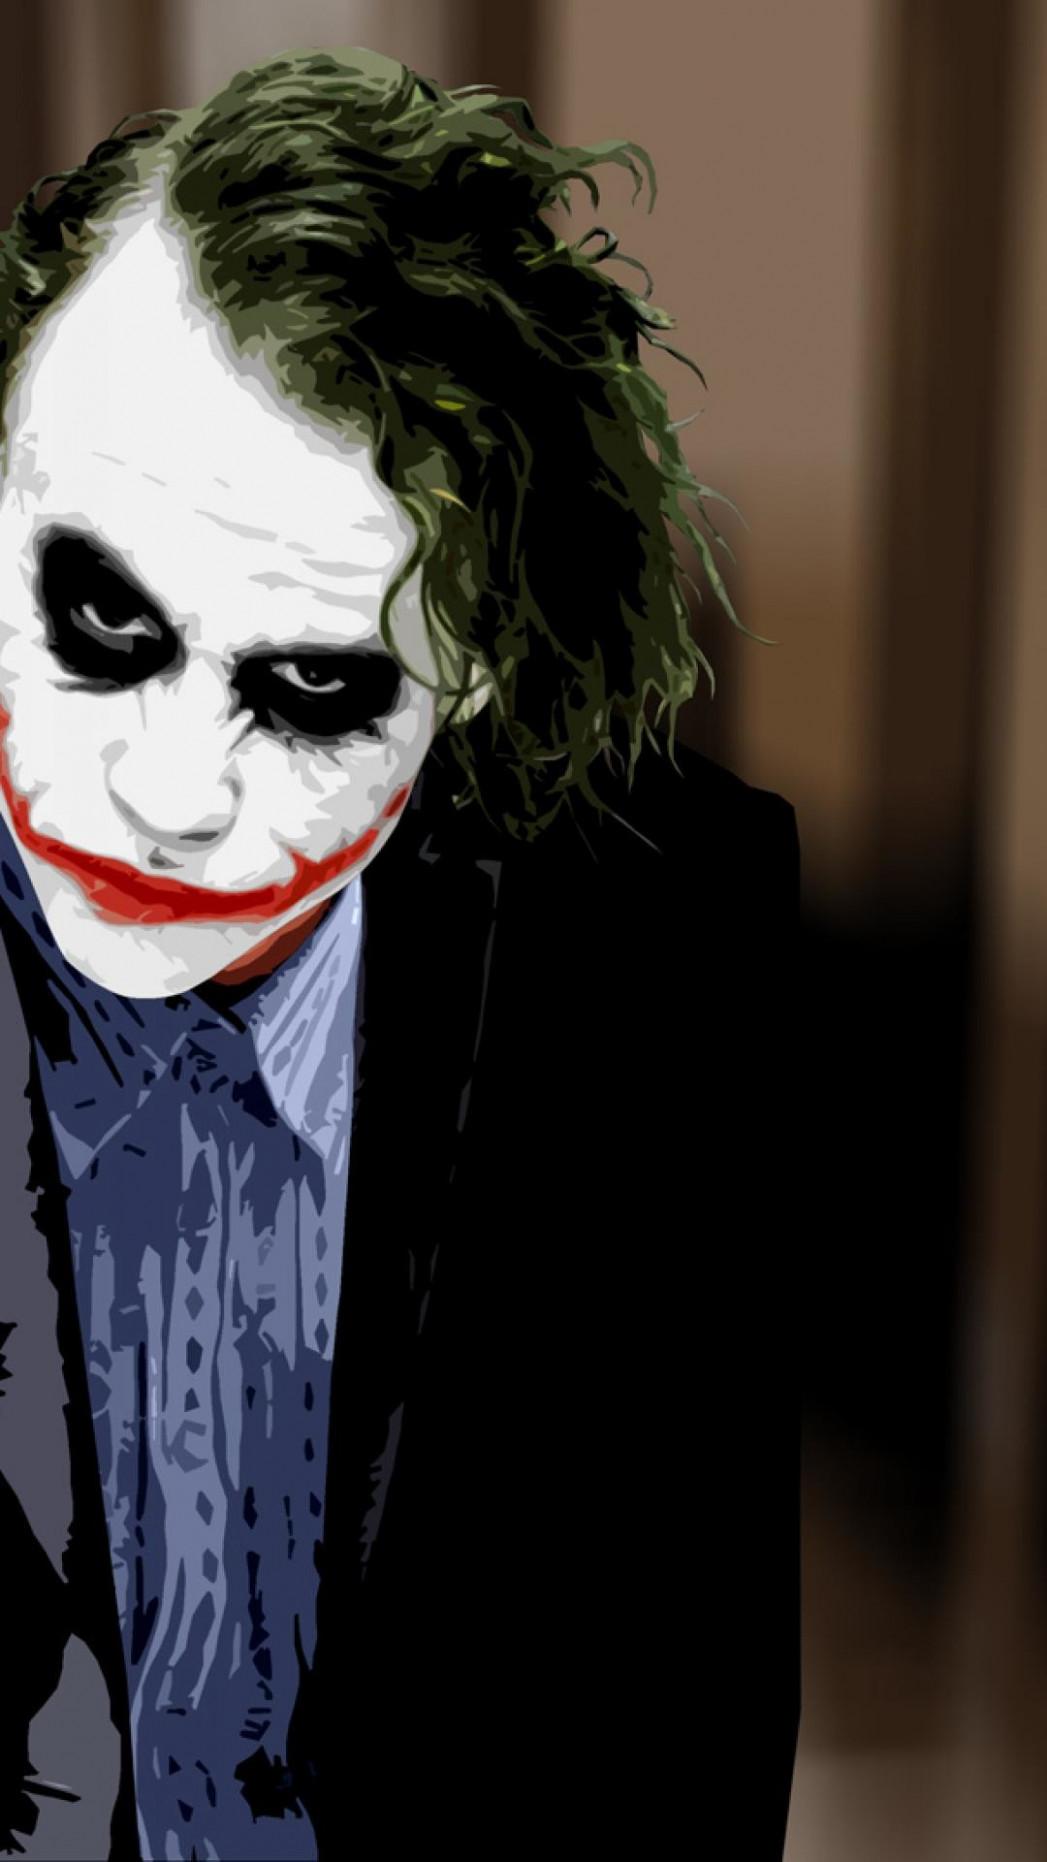 New Joker Wallpaper - Heath Ledger Joker Hd , HD Wallpaper & Backgrounds